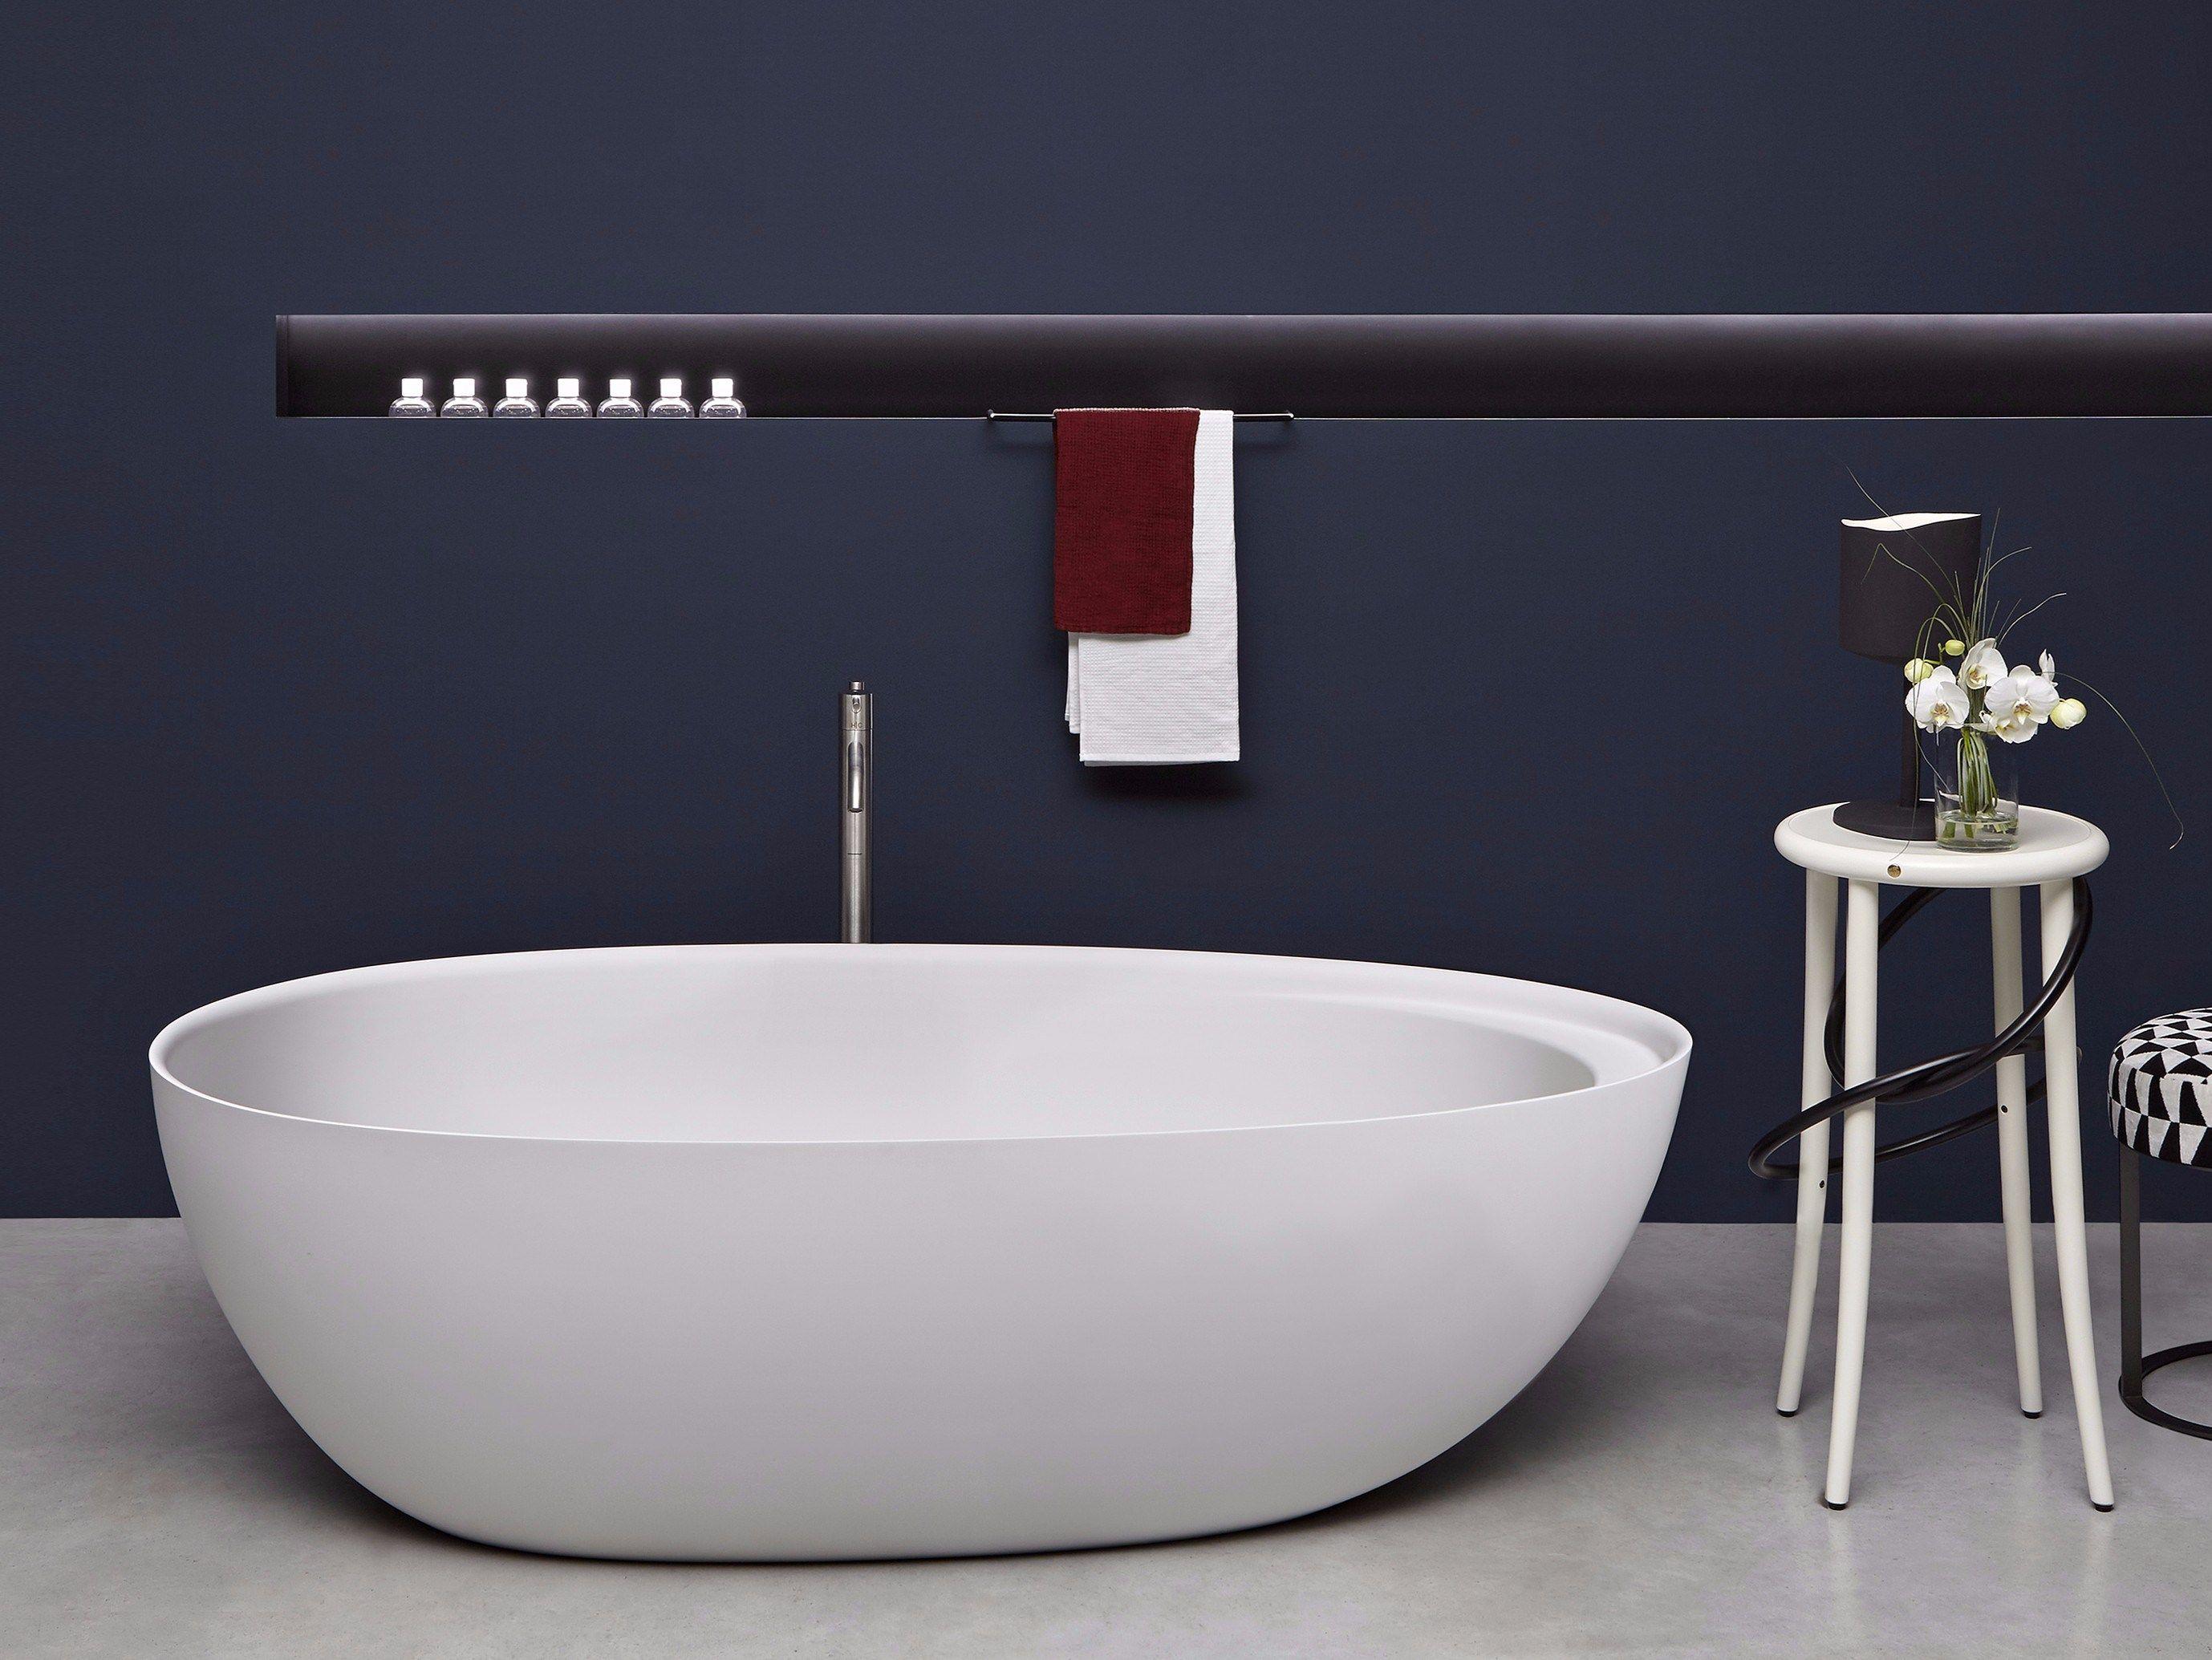 Eclipse vasca da bagno by antonio lupi design - Vasche da bagno ovali ...